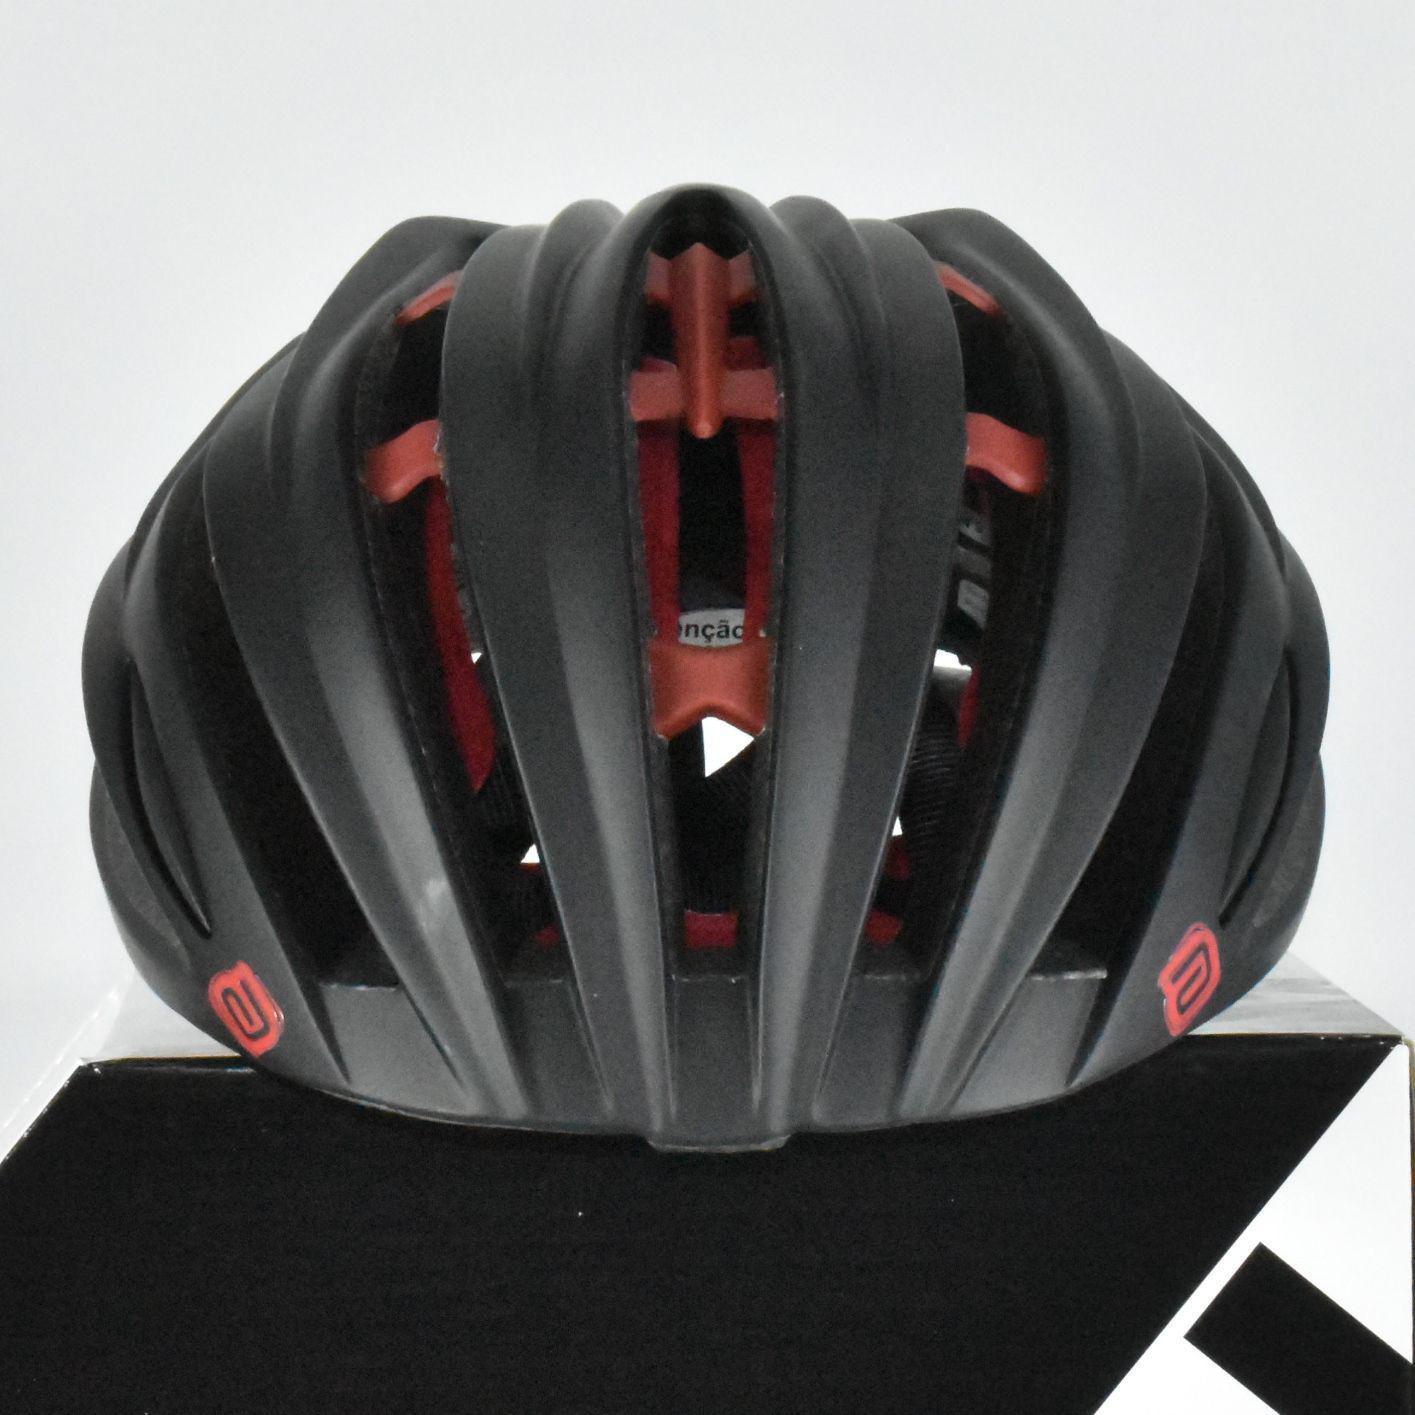 Capacete Asw Bike Elite Preto Vermelho Bicicleta Montain - Capacete Ciclismo  - Magazine Luiza